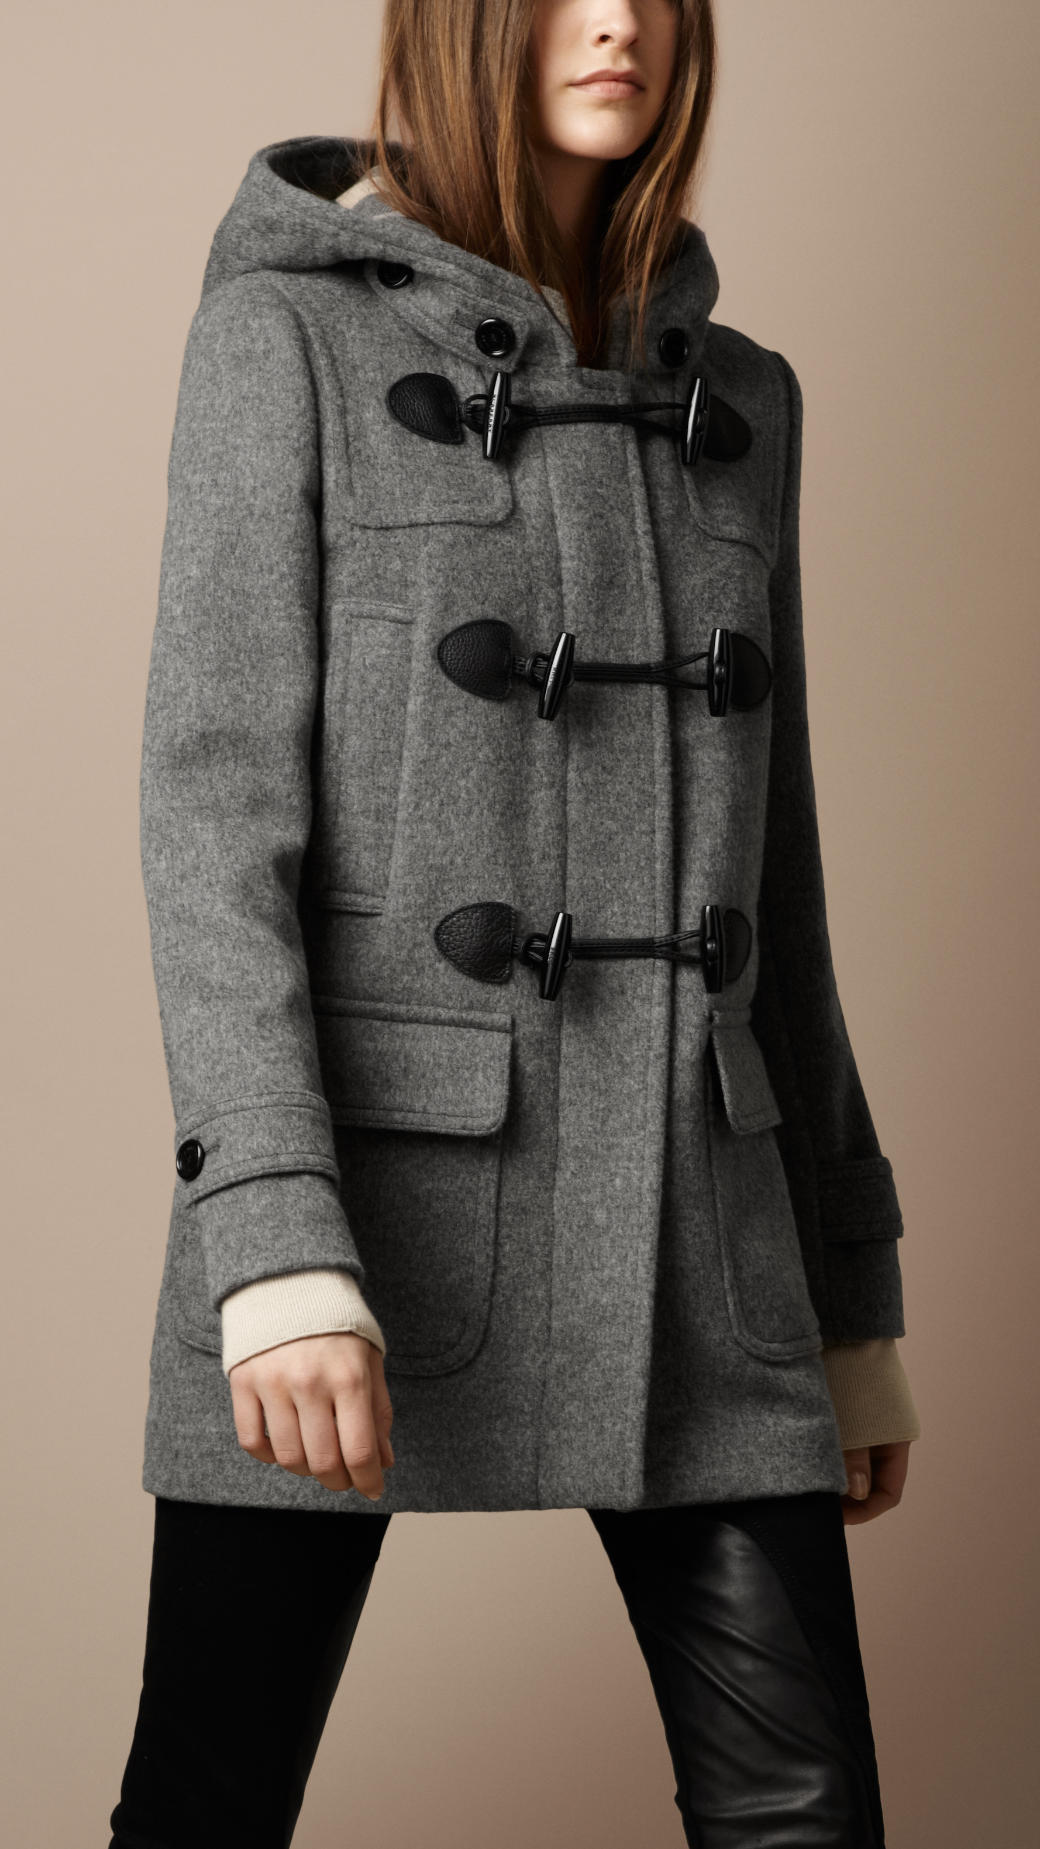 Burberry Brit Wool Duffle Coat in Gray - Lyst